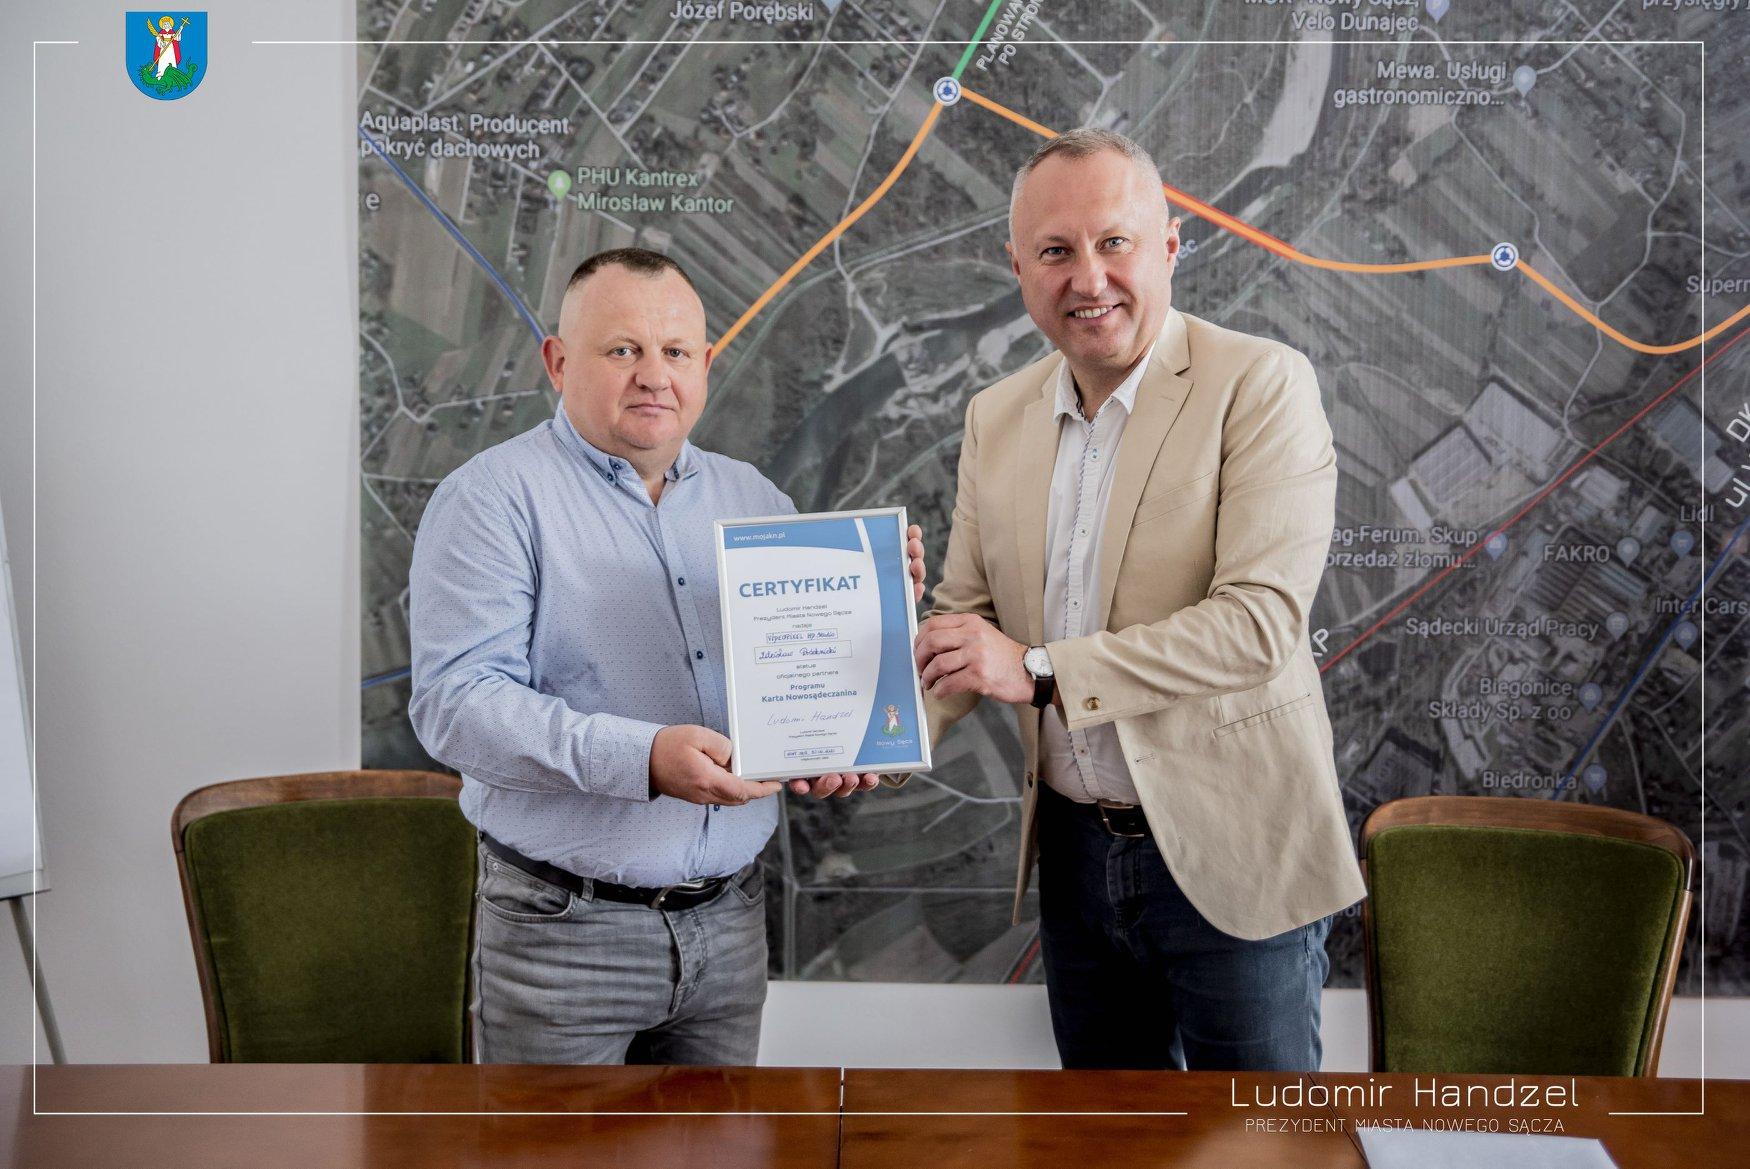 ? VIDEOPIXEL, HD STUDIO – partnerem Karty Nowosądeczanina.??